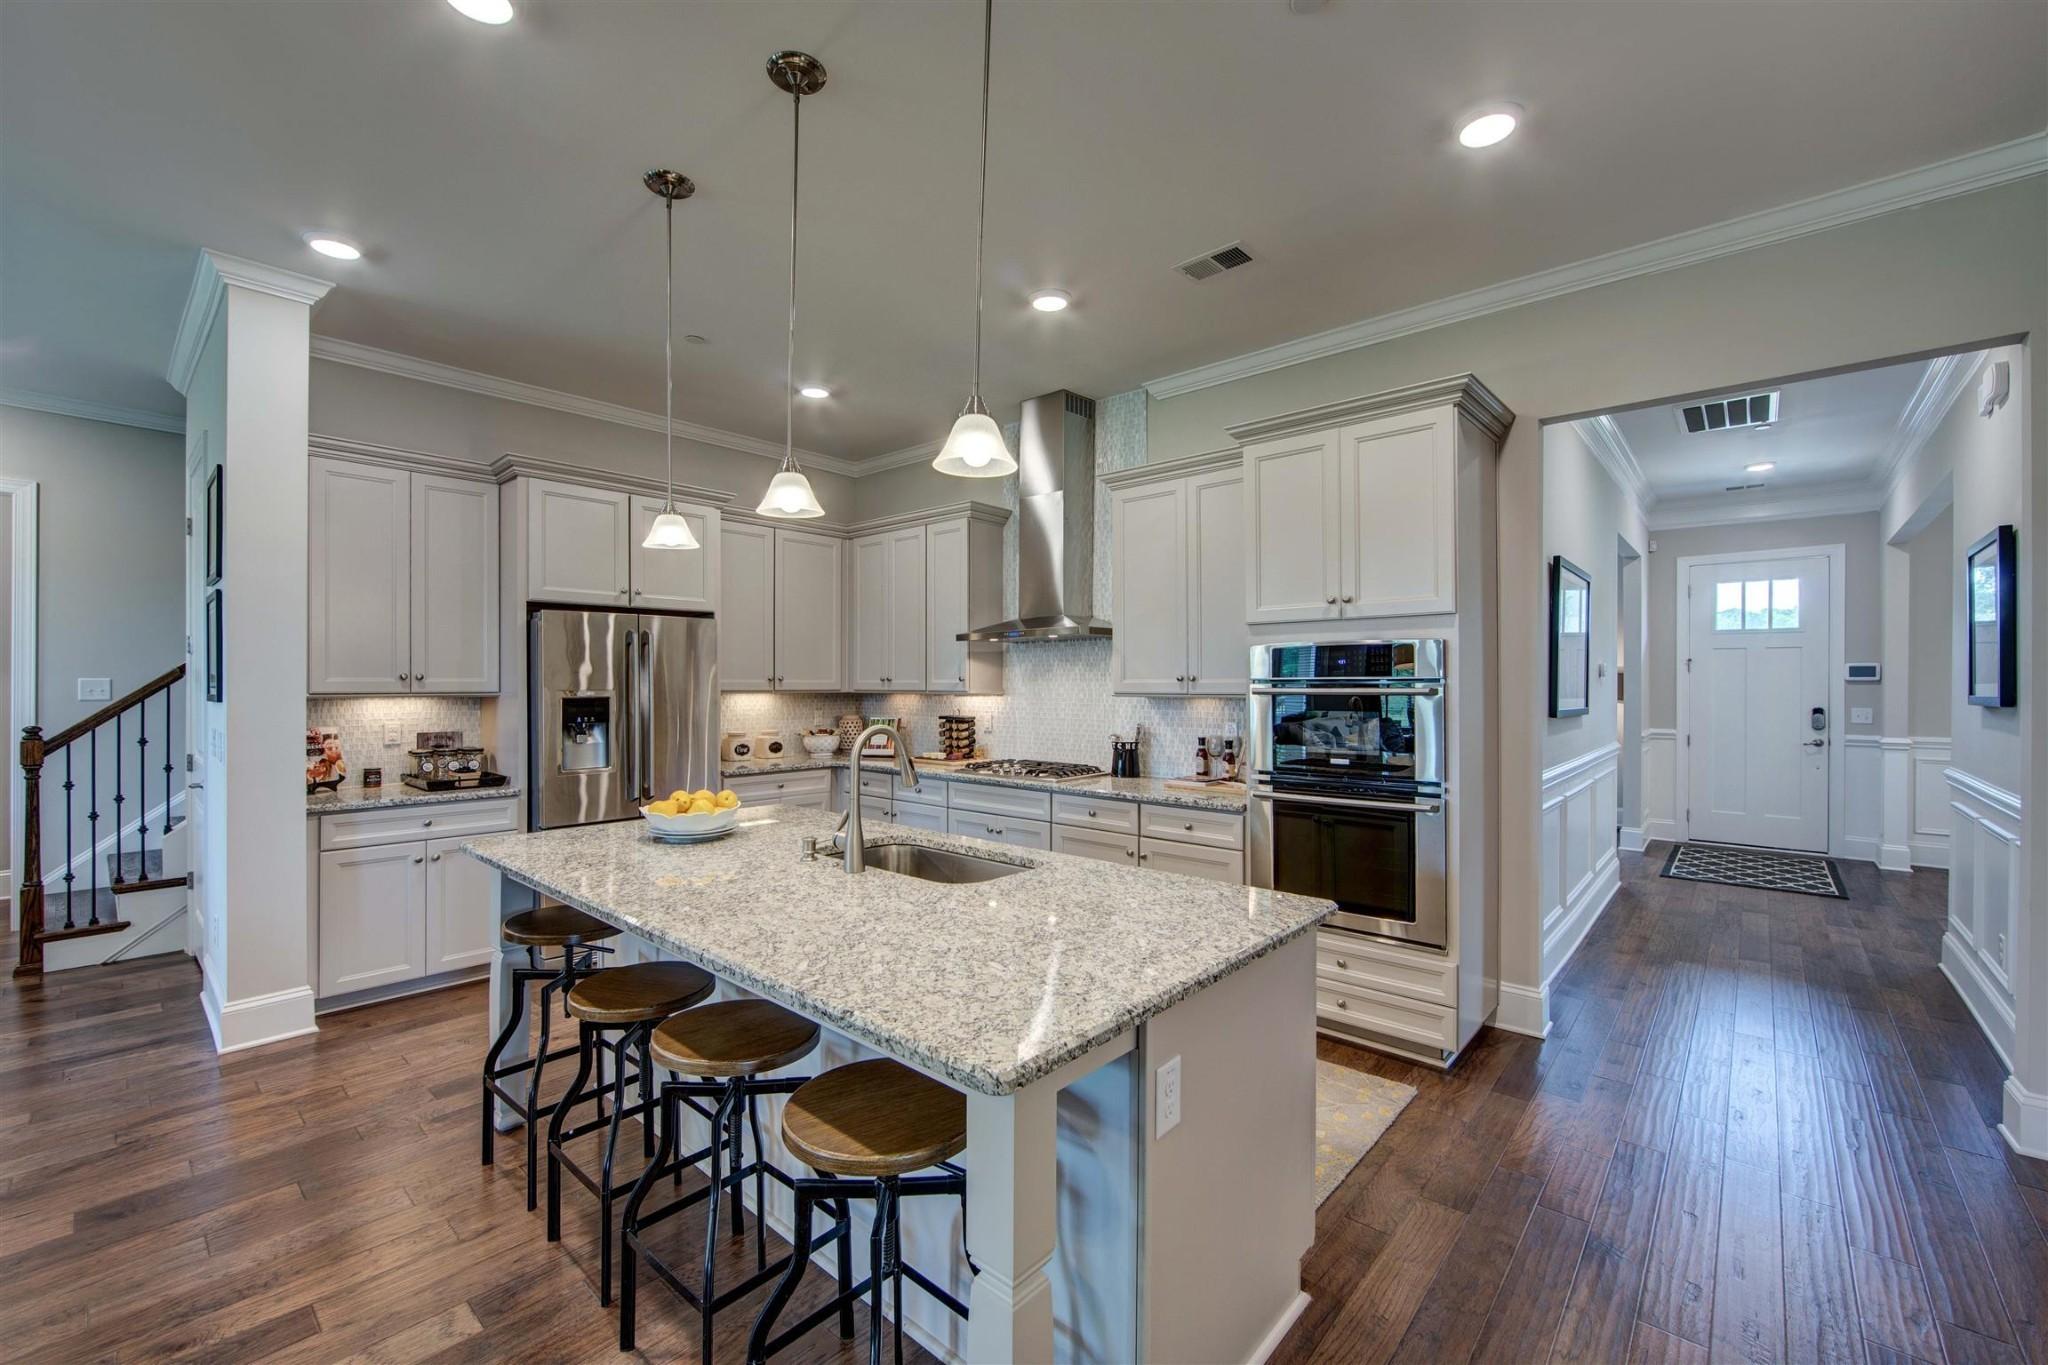 914 Los Lomas Lot #71, Nolensville, TN 37135 - Nolensville, TN real estate listing